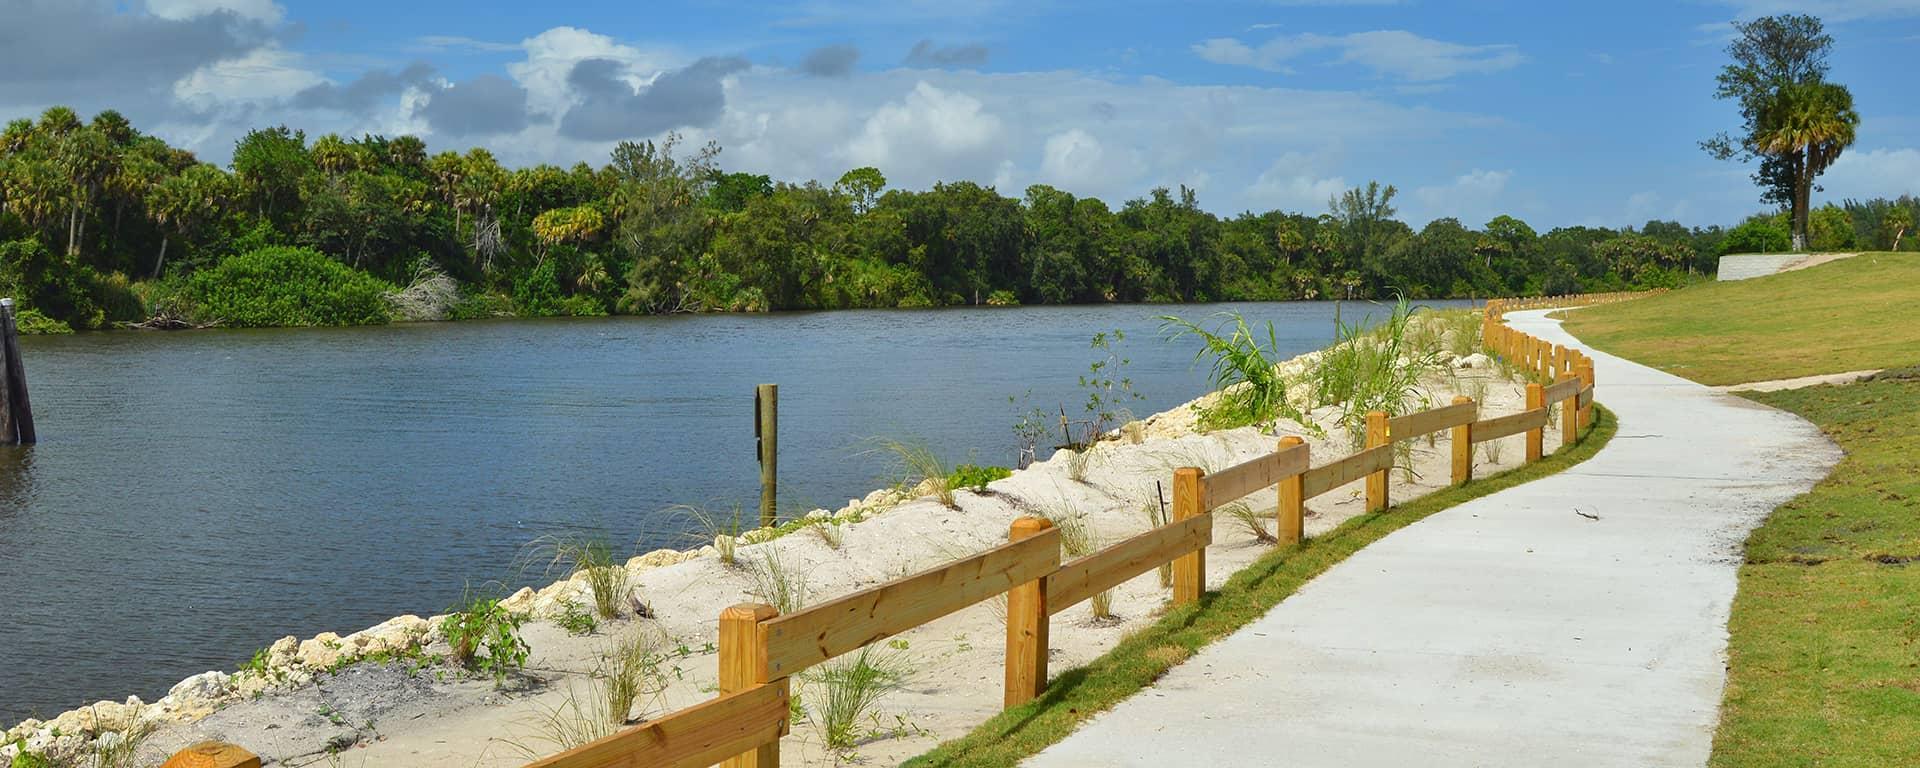 Shoreline at Phipps Park